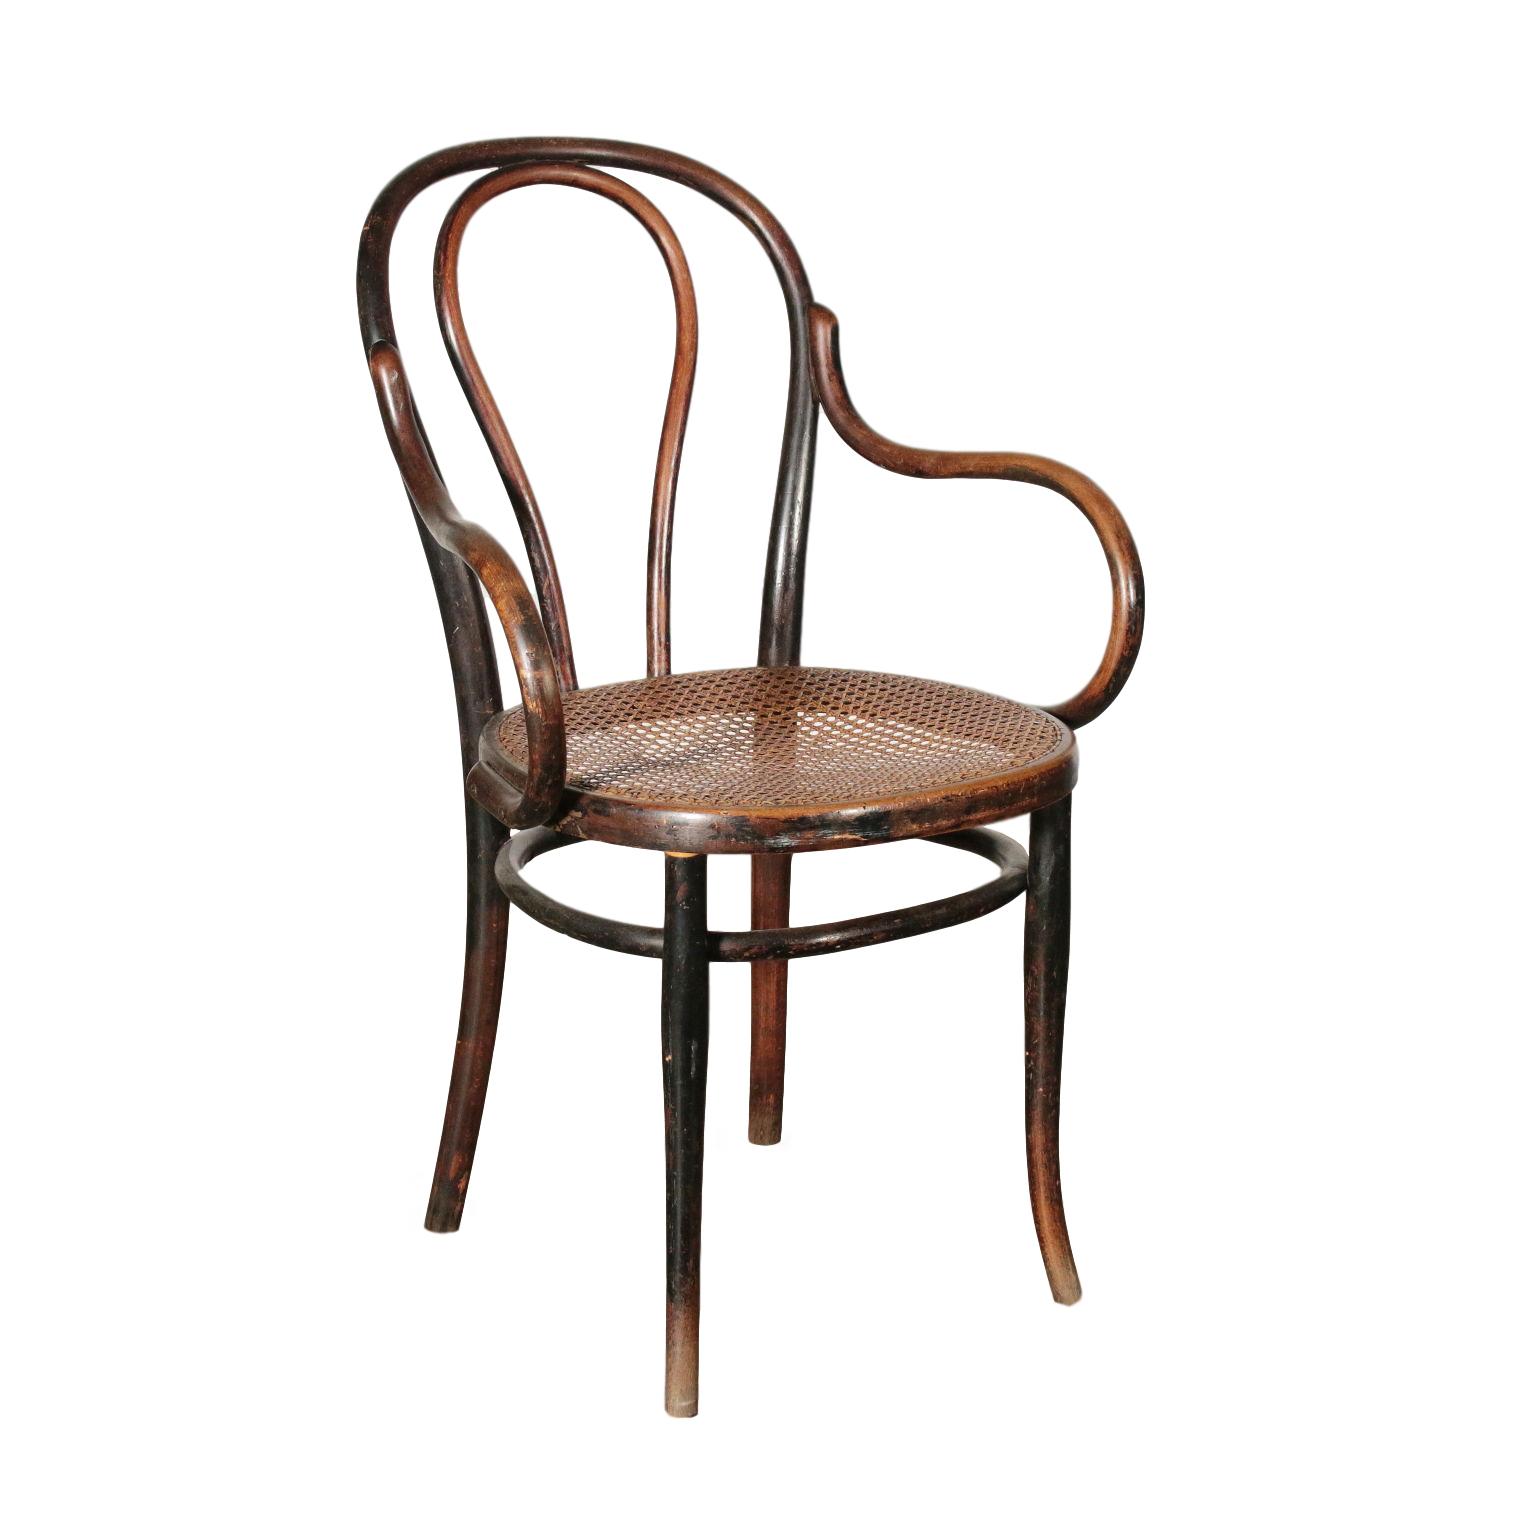 Sessel Thonet Stuhlen Sesseln Sofas Antiquitaten Dimanoinmano It